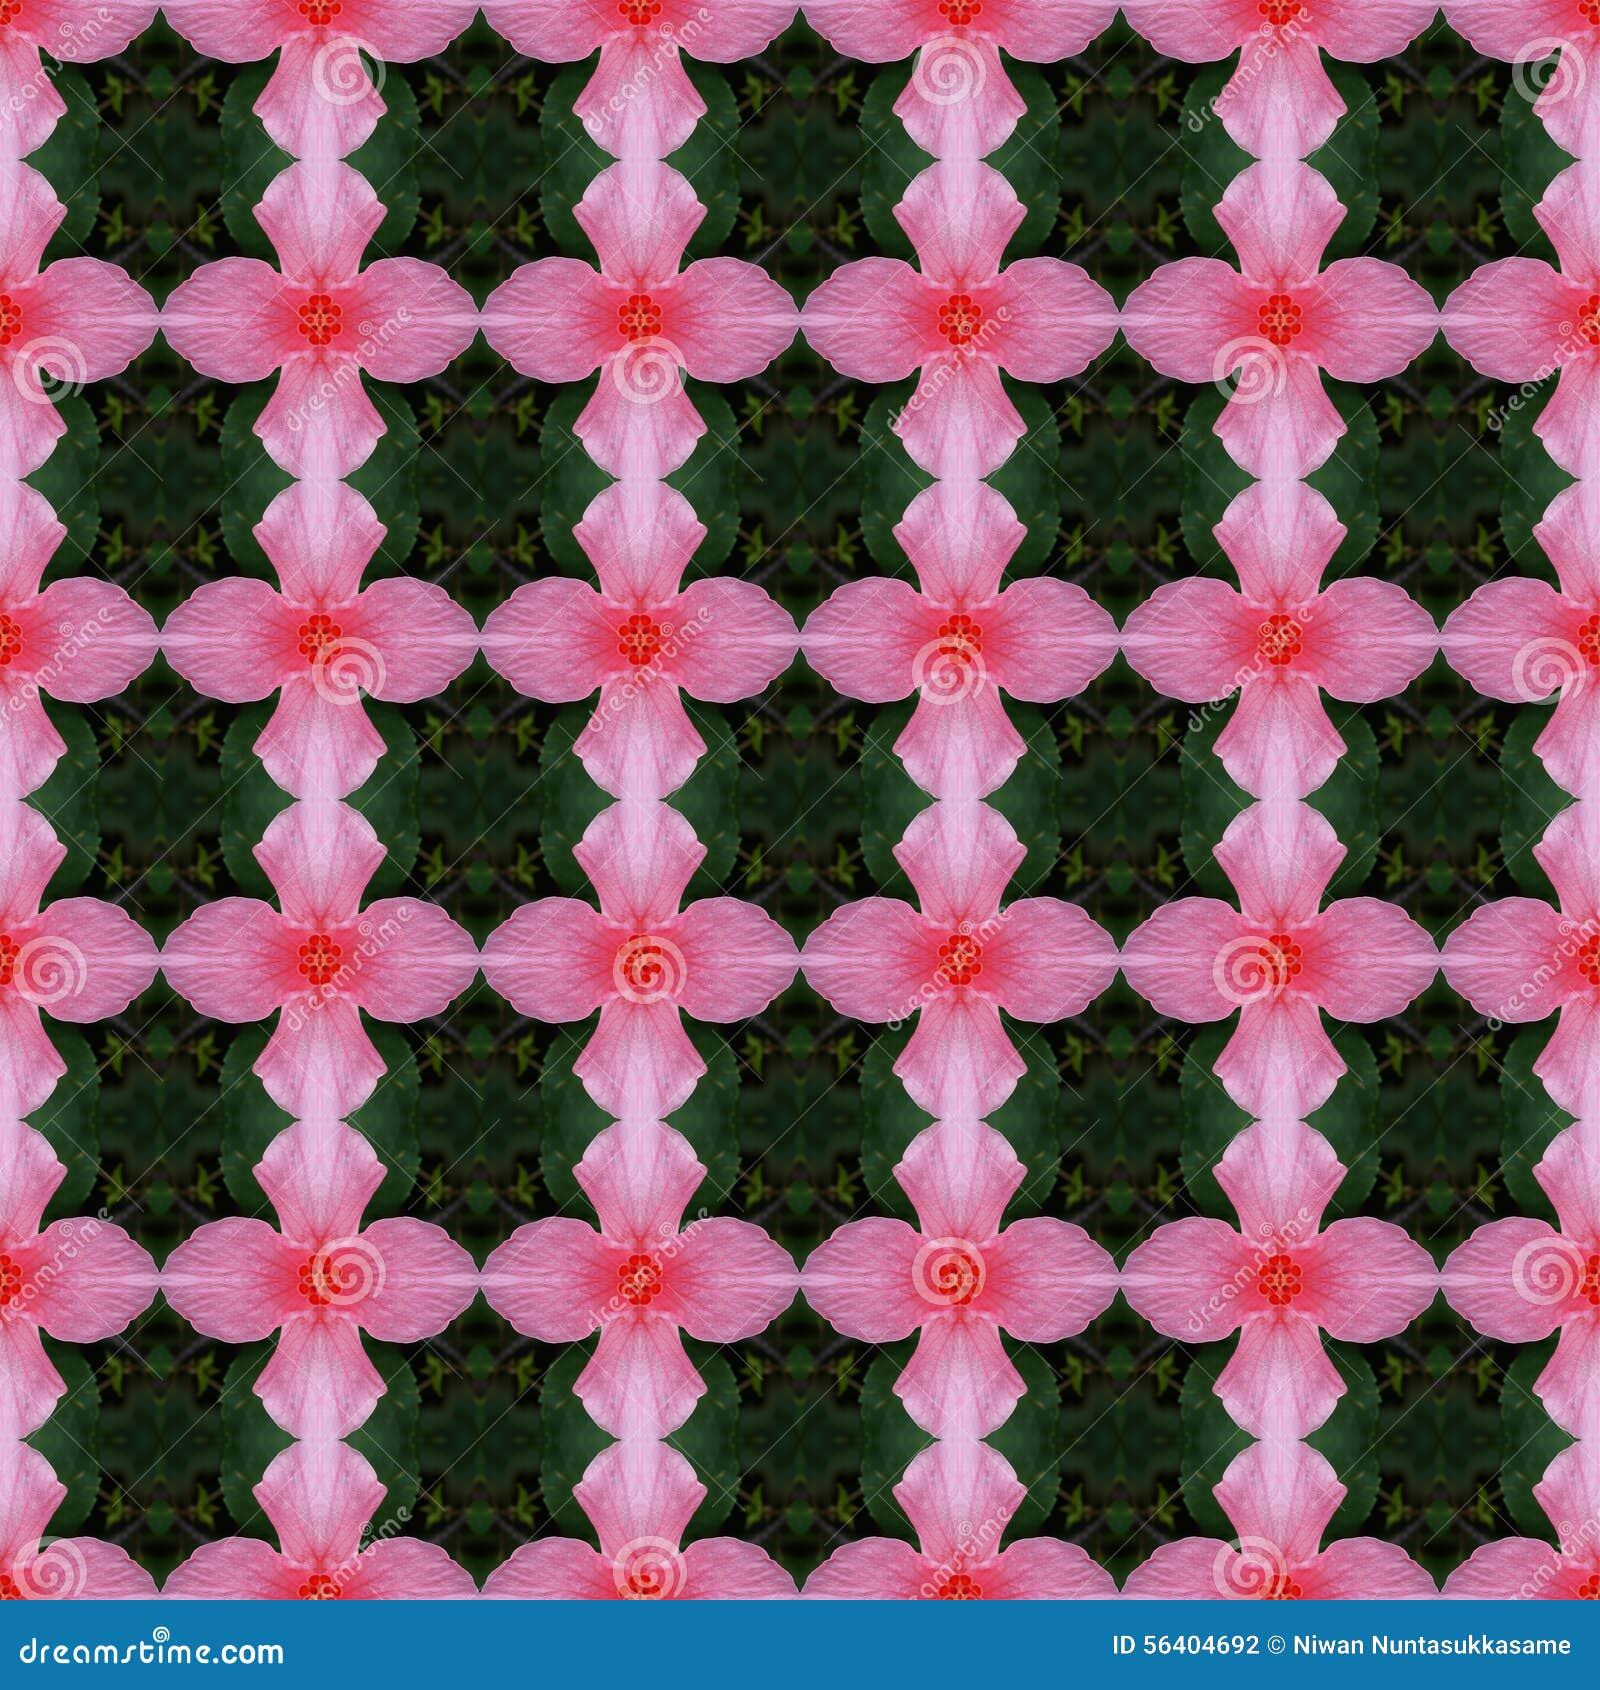 Rosa Farbe der Hibiscusblume in voller Blüte nahtlos